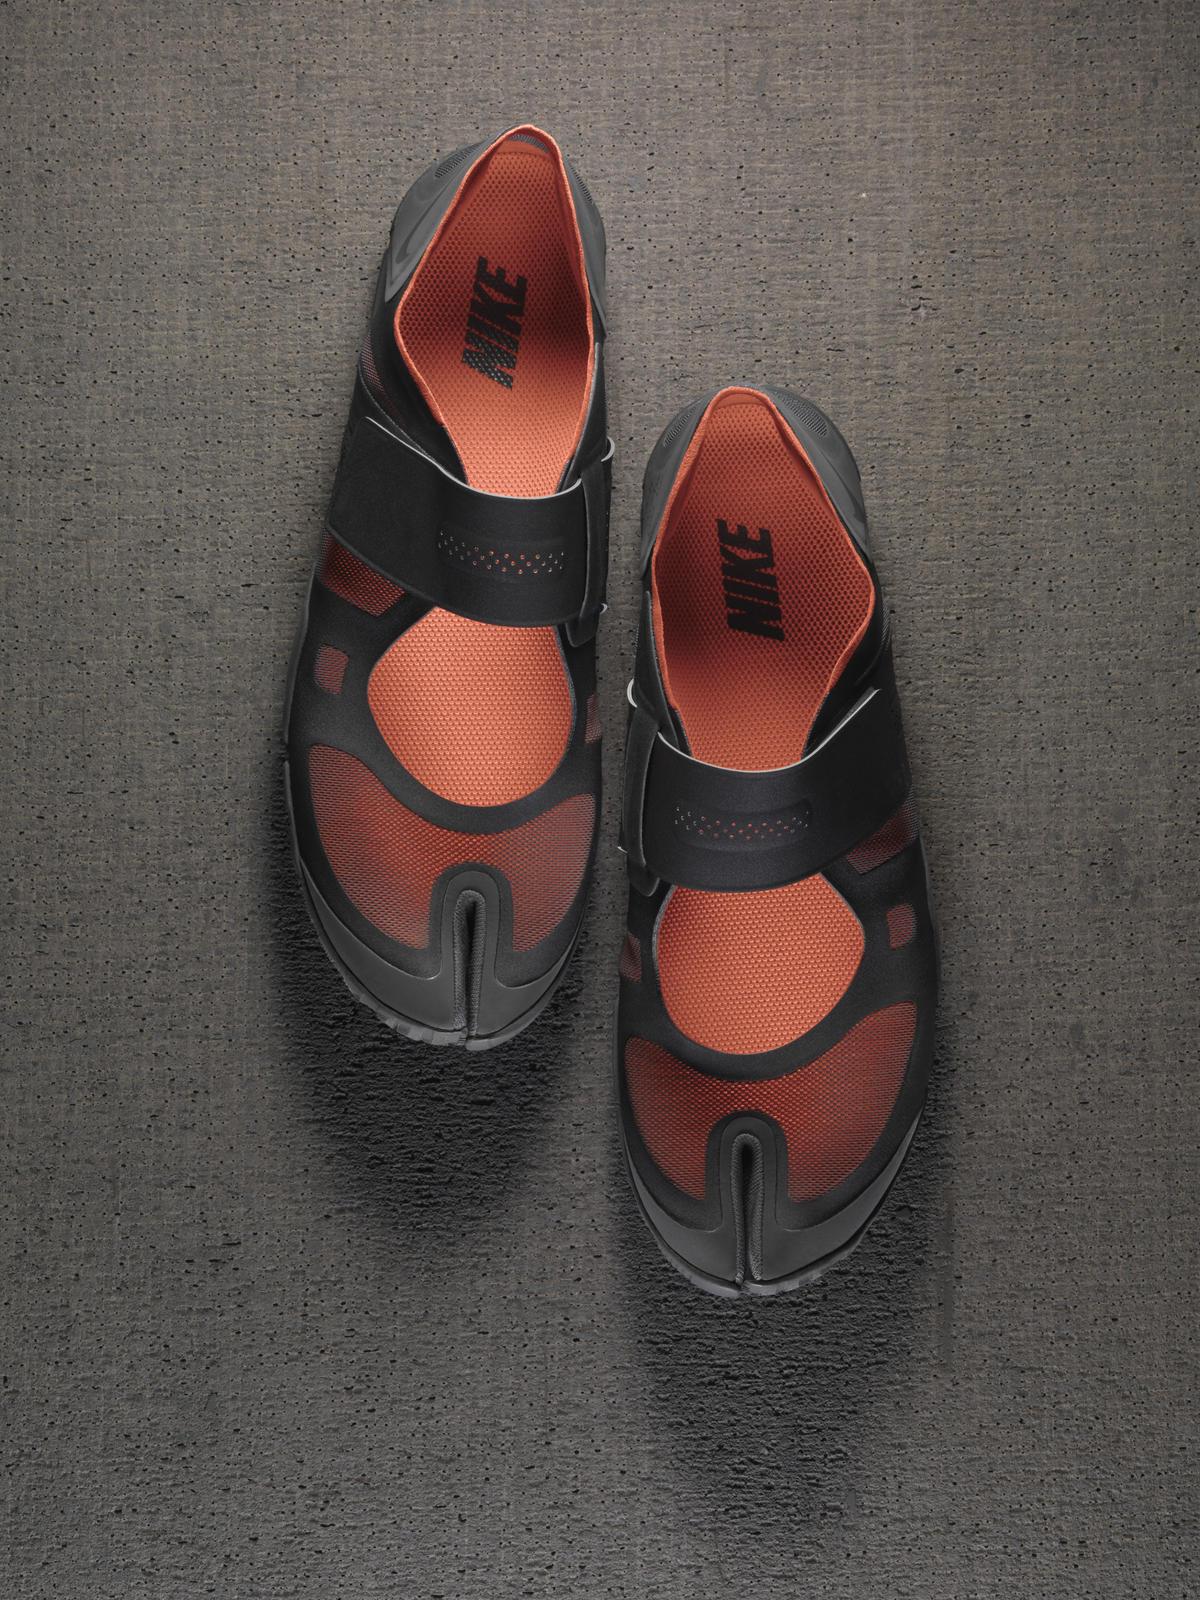 nike barefoot shoes